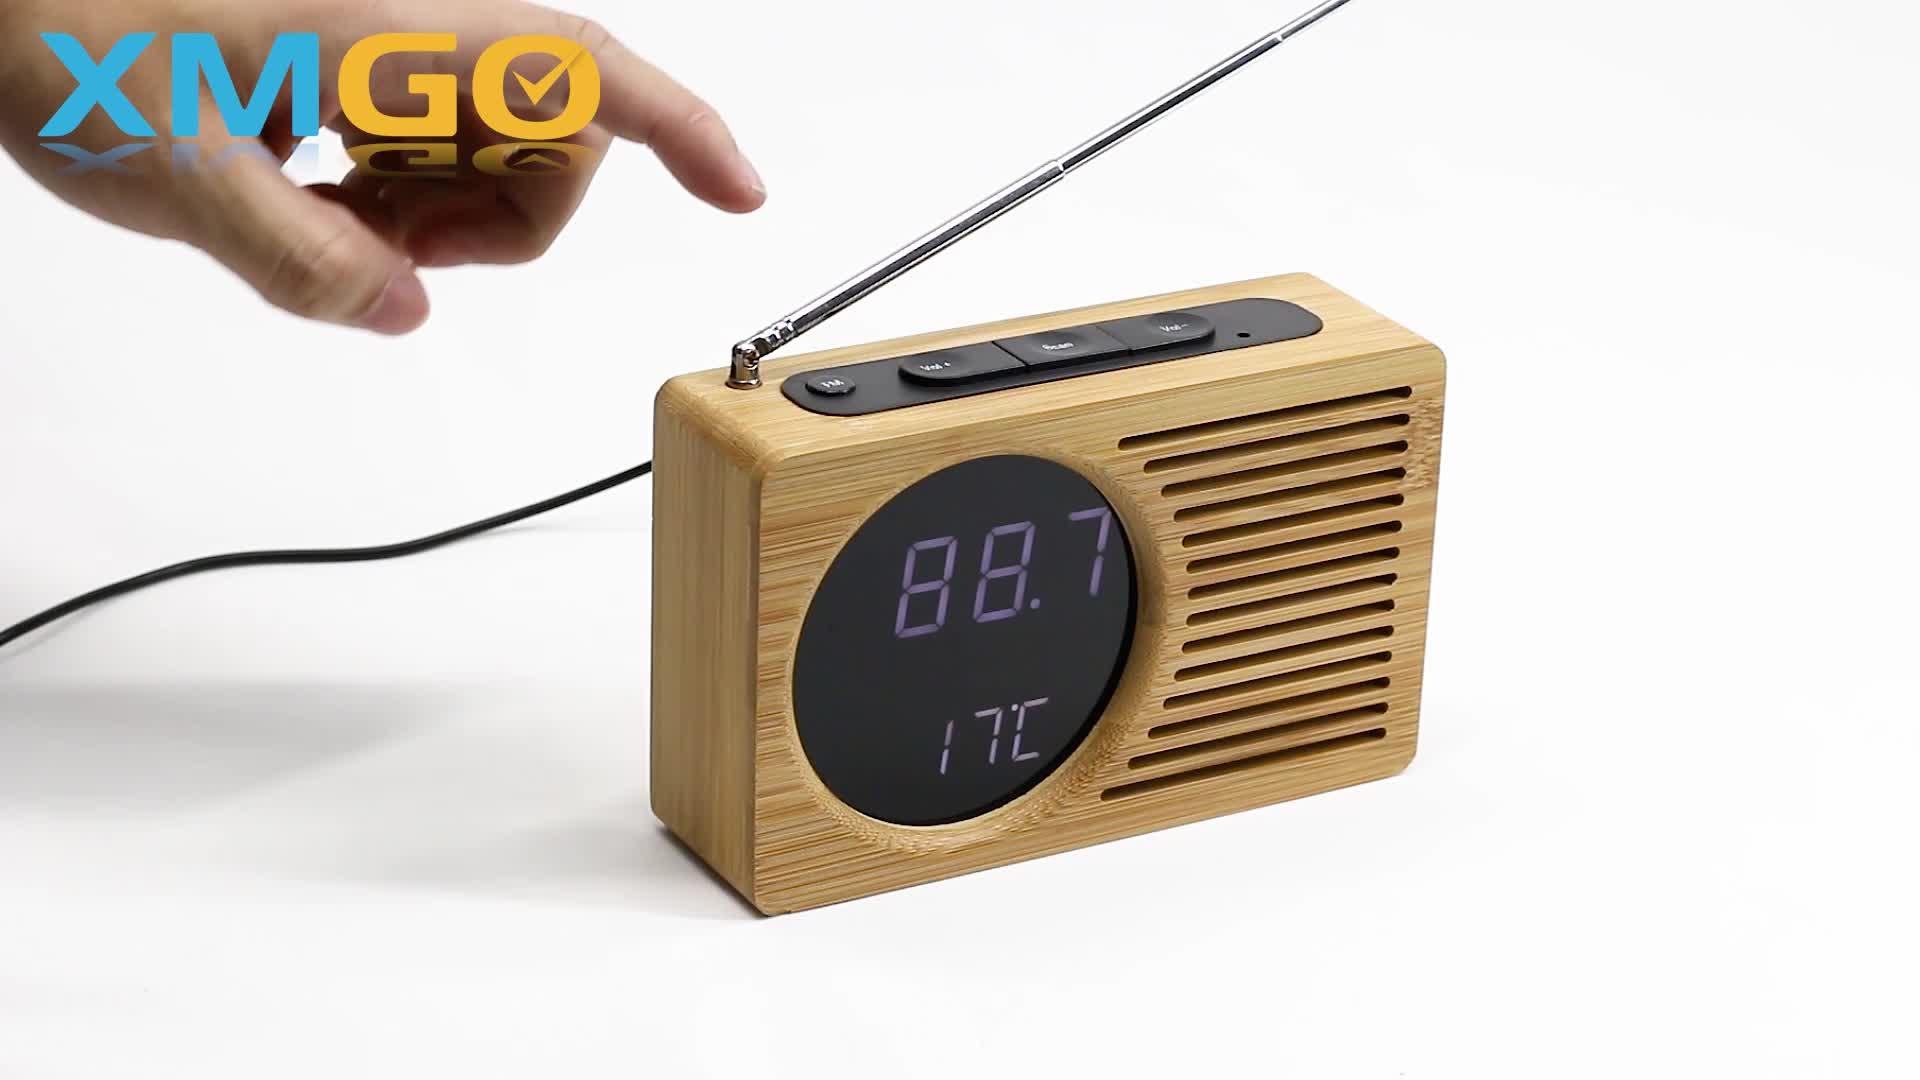 KH-WC013 KING HEIGHT 3 Level Brightness LED Digital Retro Alarm Radio Clock